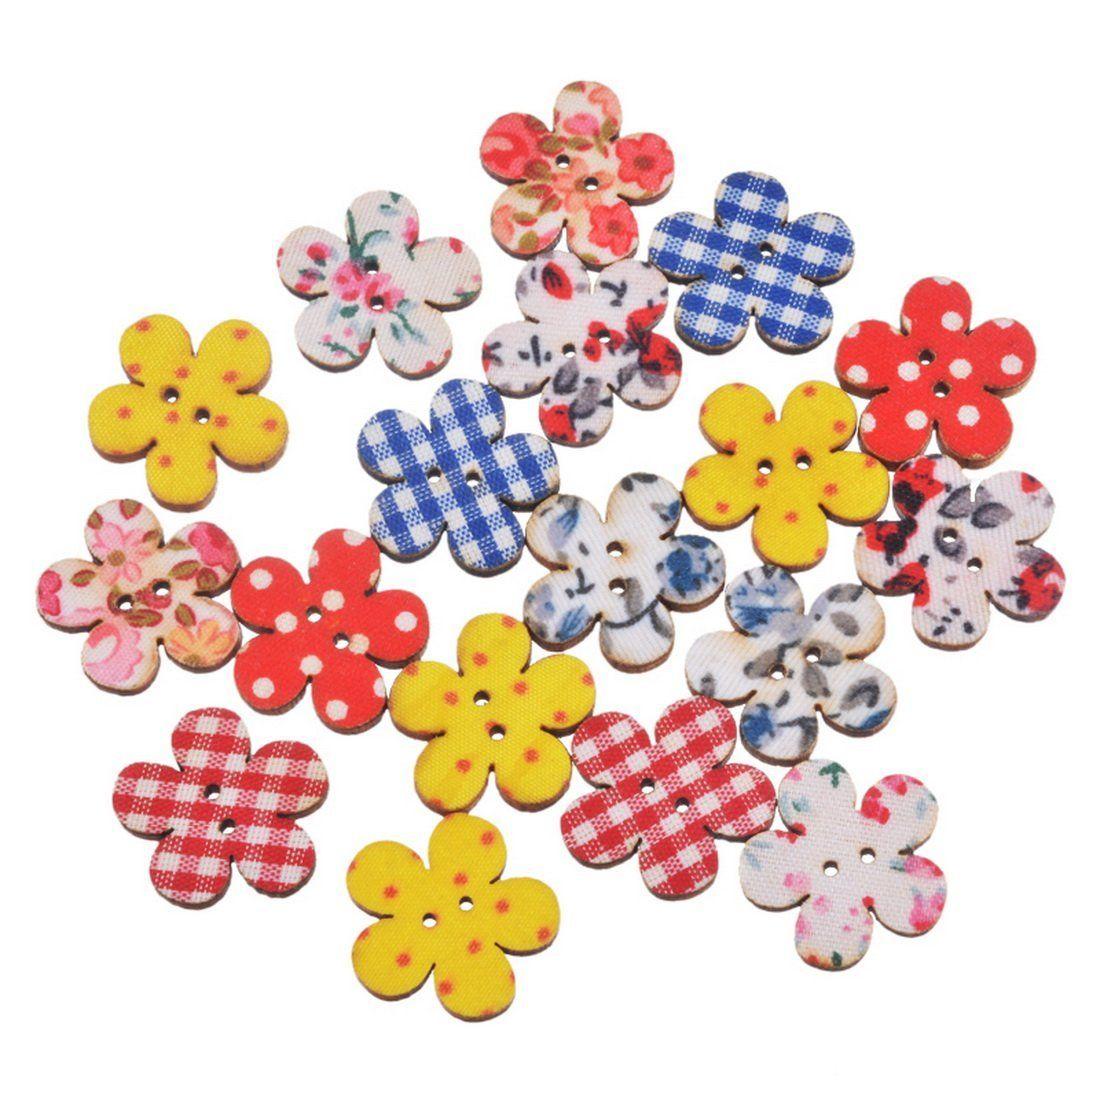 50Pcs Wood Mixed Flower Handmade 2 Holes Wooden Buttons Sewing Scrapbooking DIY